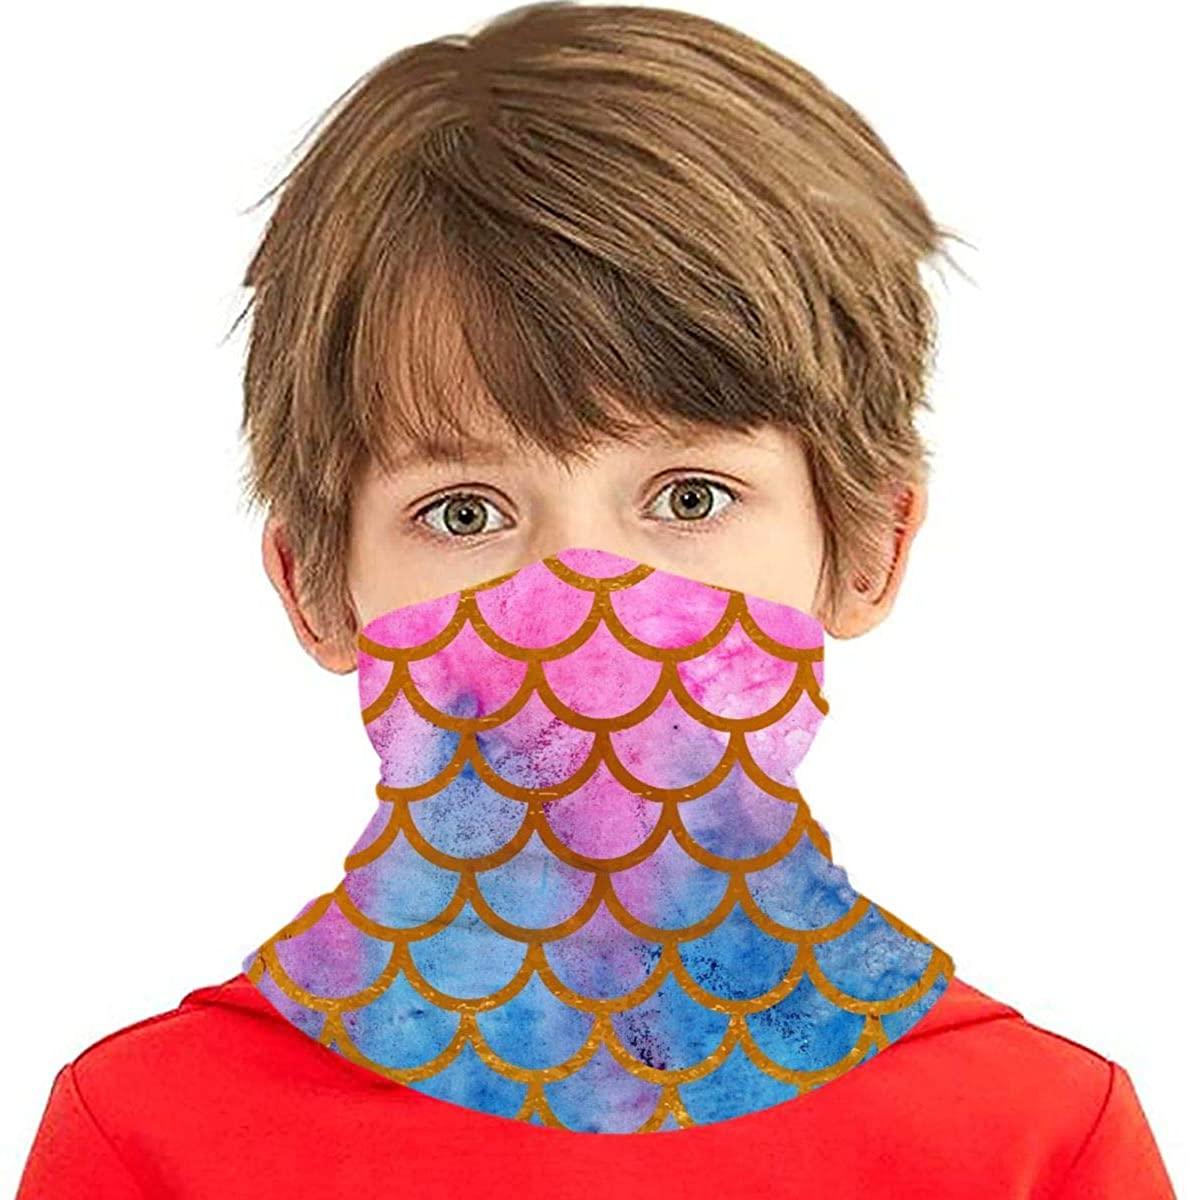 Mermaid Scale - Face Mask - Kids Sibling Bandanas Face Magical Multi Funtion UV Protectio Neck Gaiter Headband - Boys Girls Dust Block Balaclavas